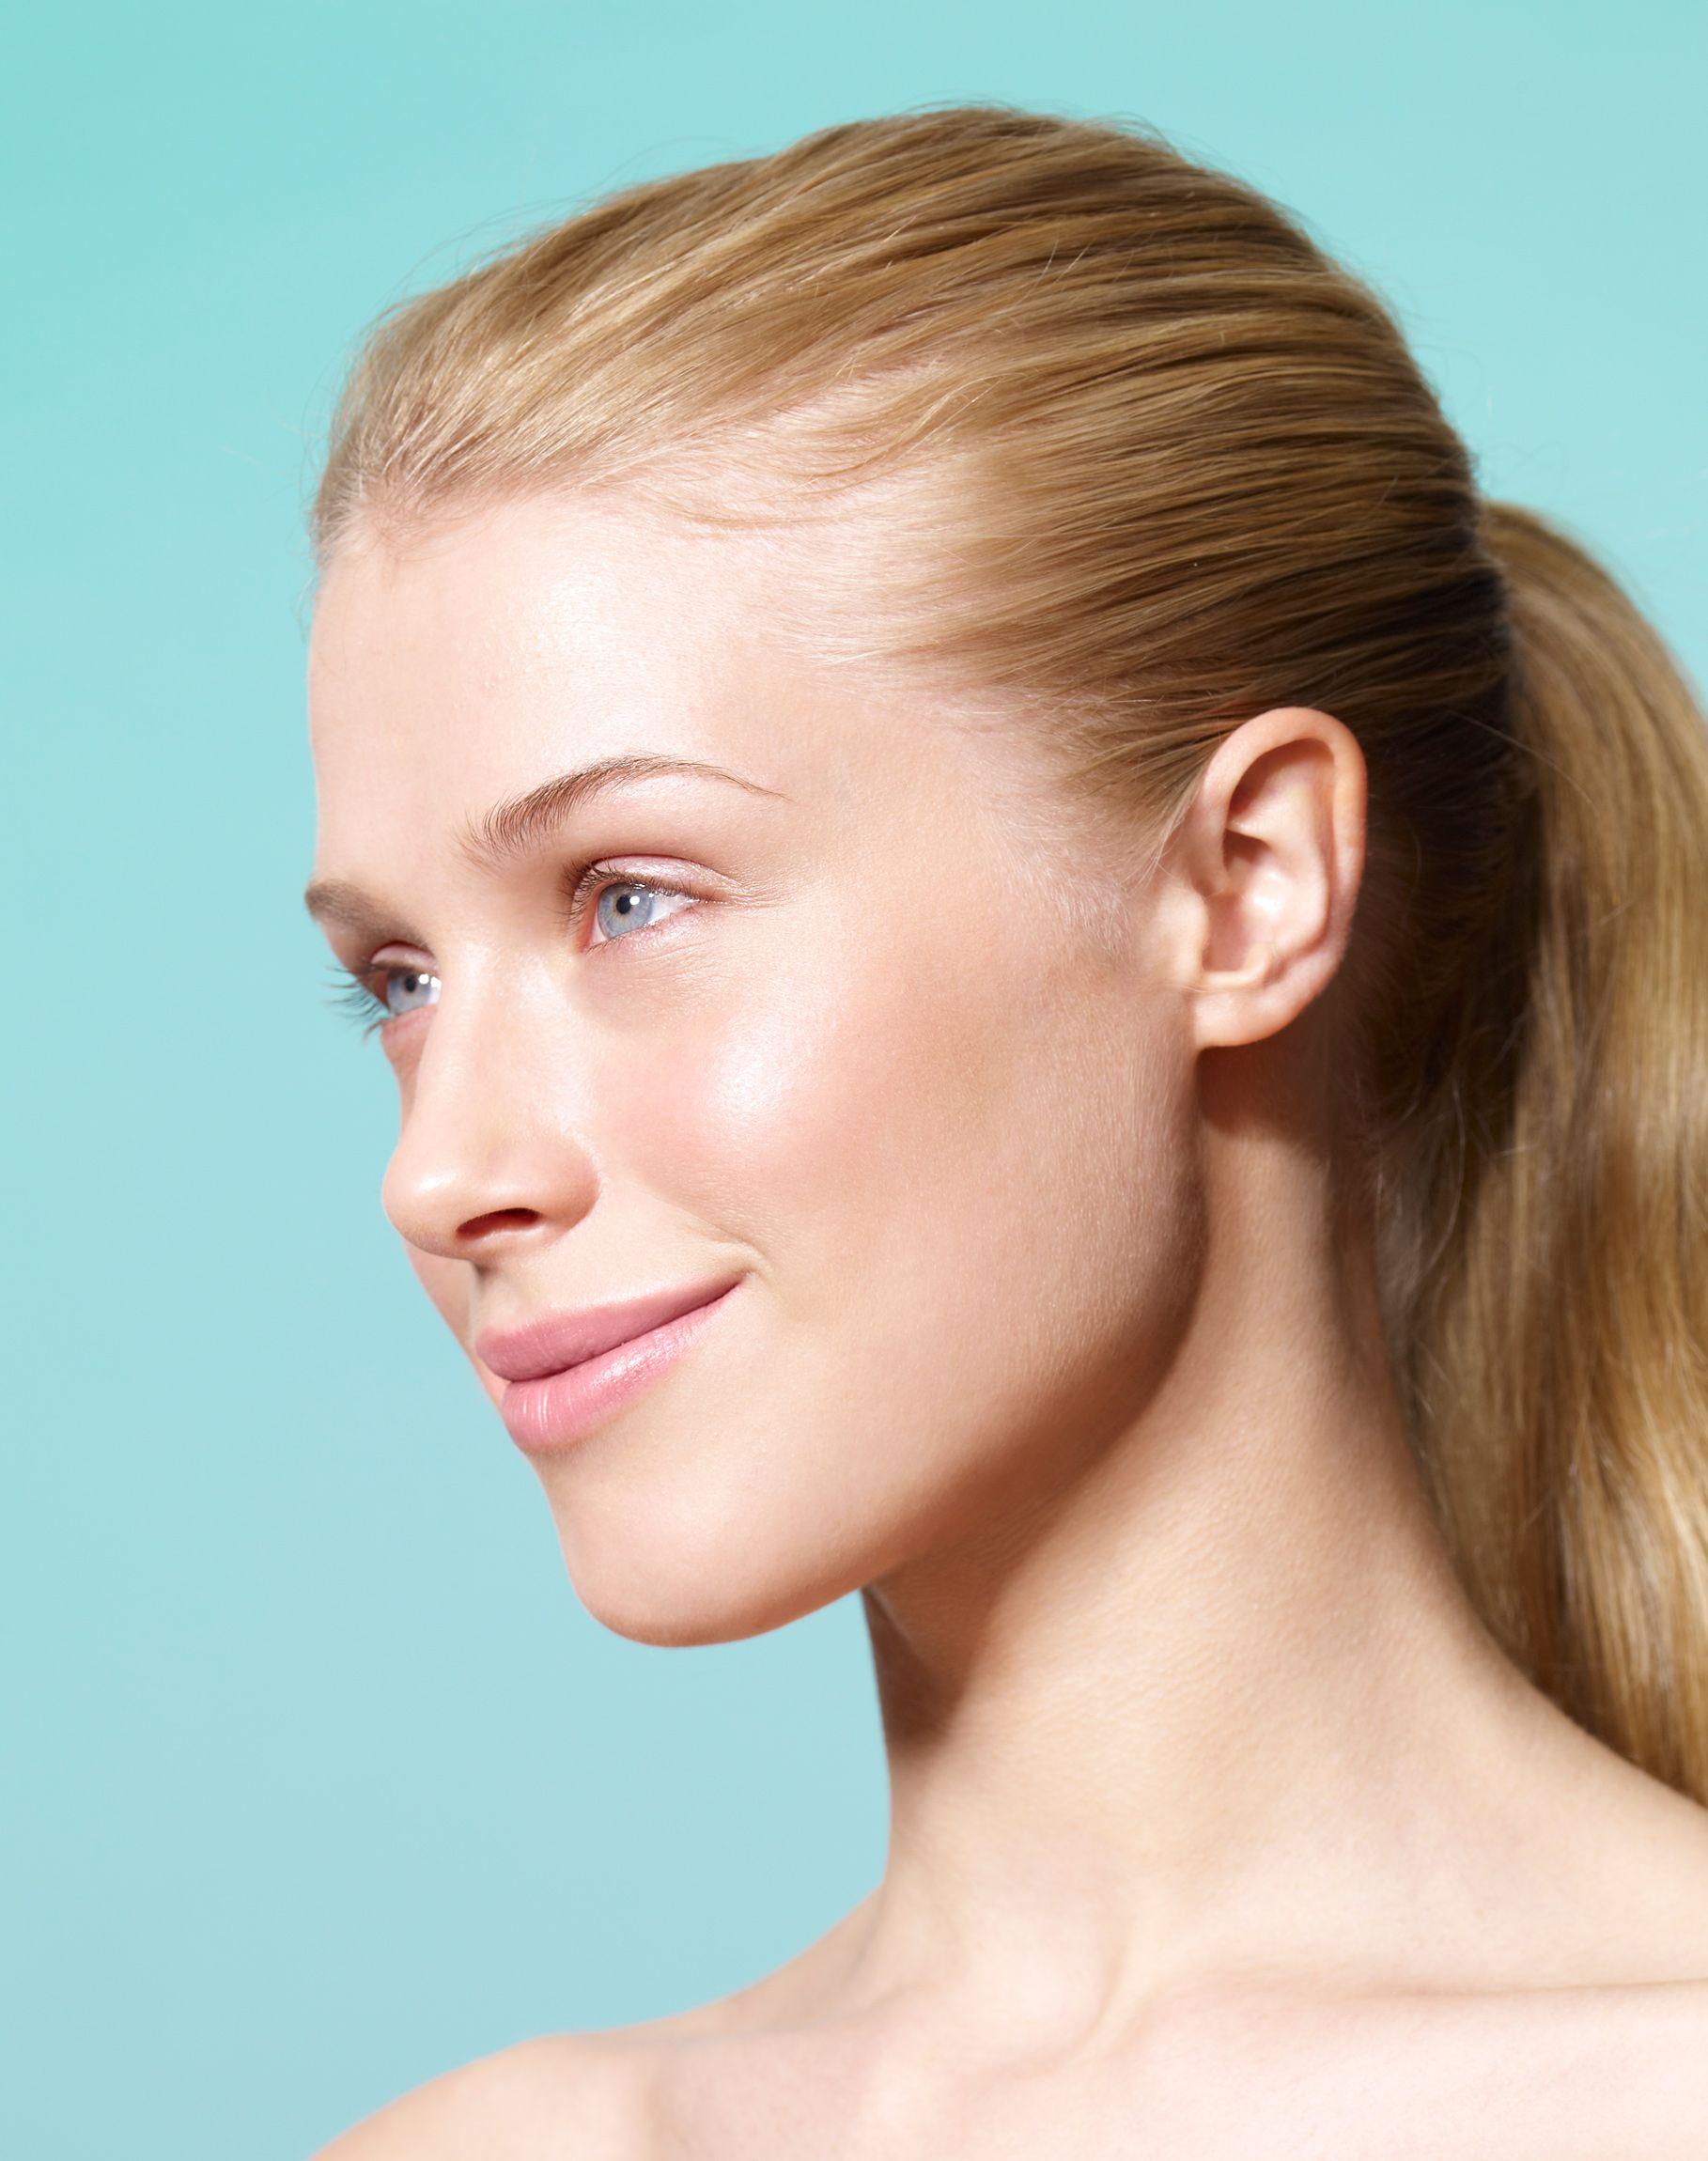 NeedleFree Ways to Make Those Forehead Wrinkles Fade